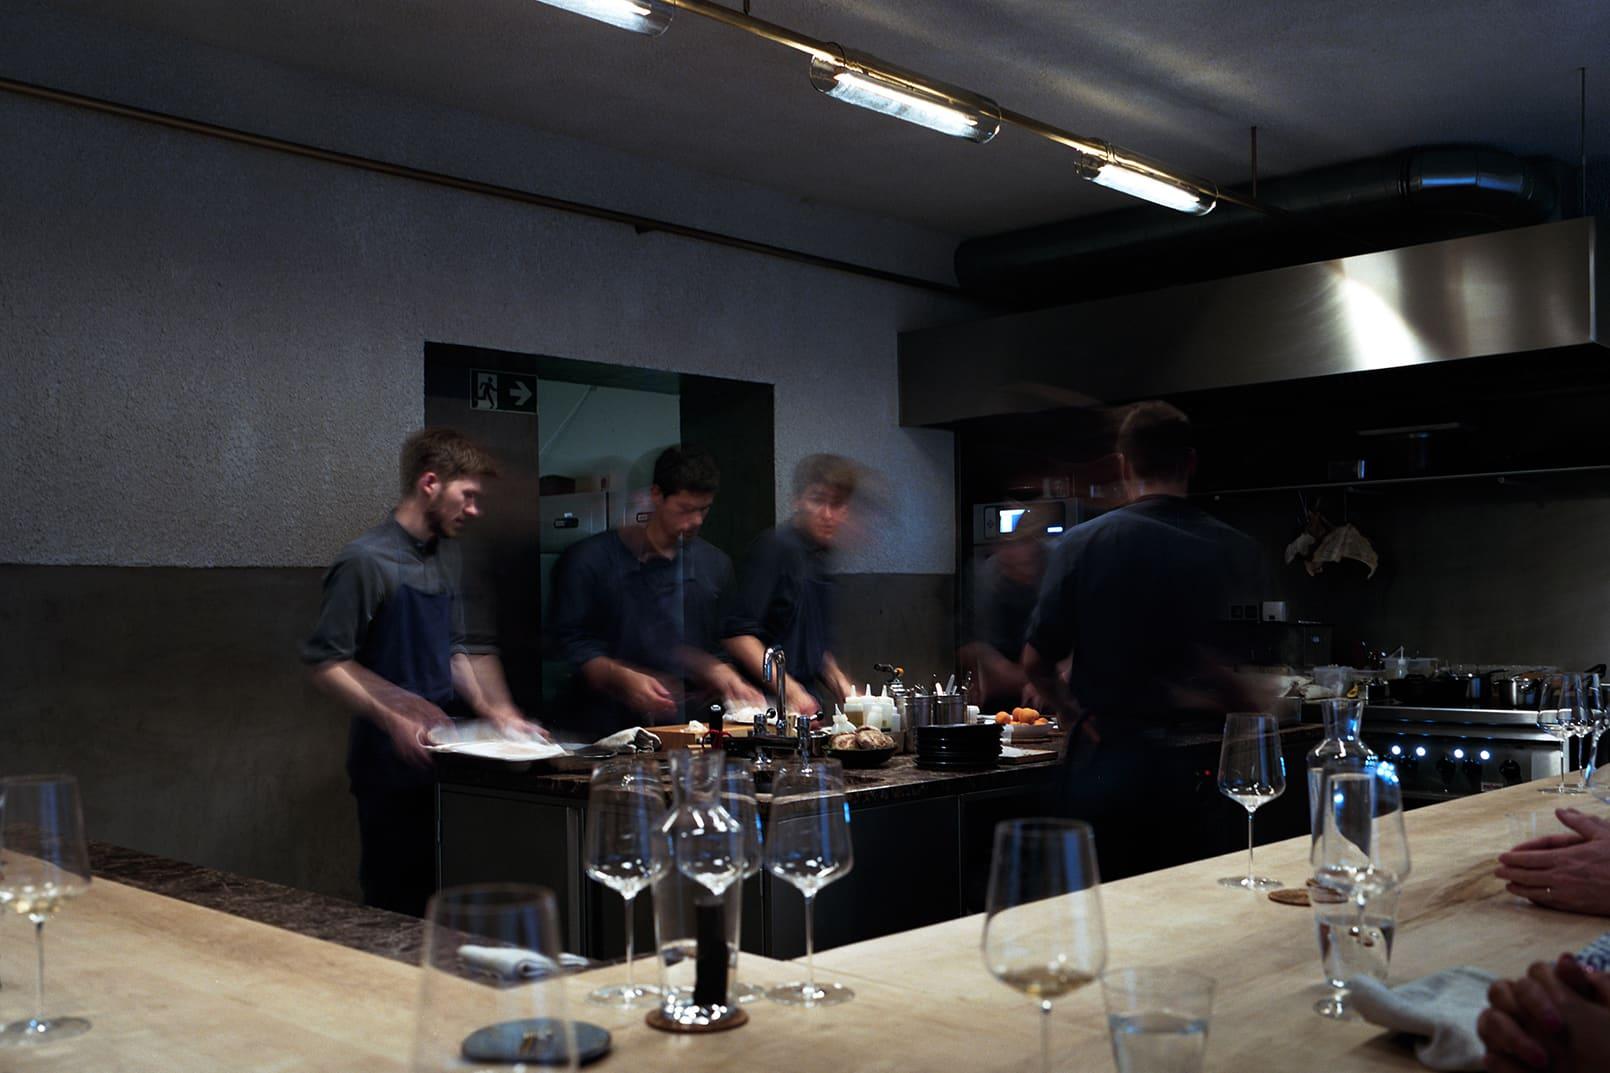 The restaurant is an open bar kitchen. Photo credit: Maidje Meergans